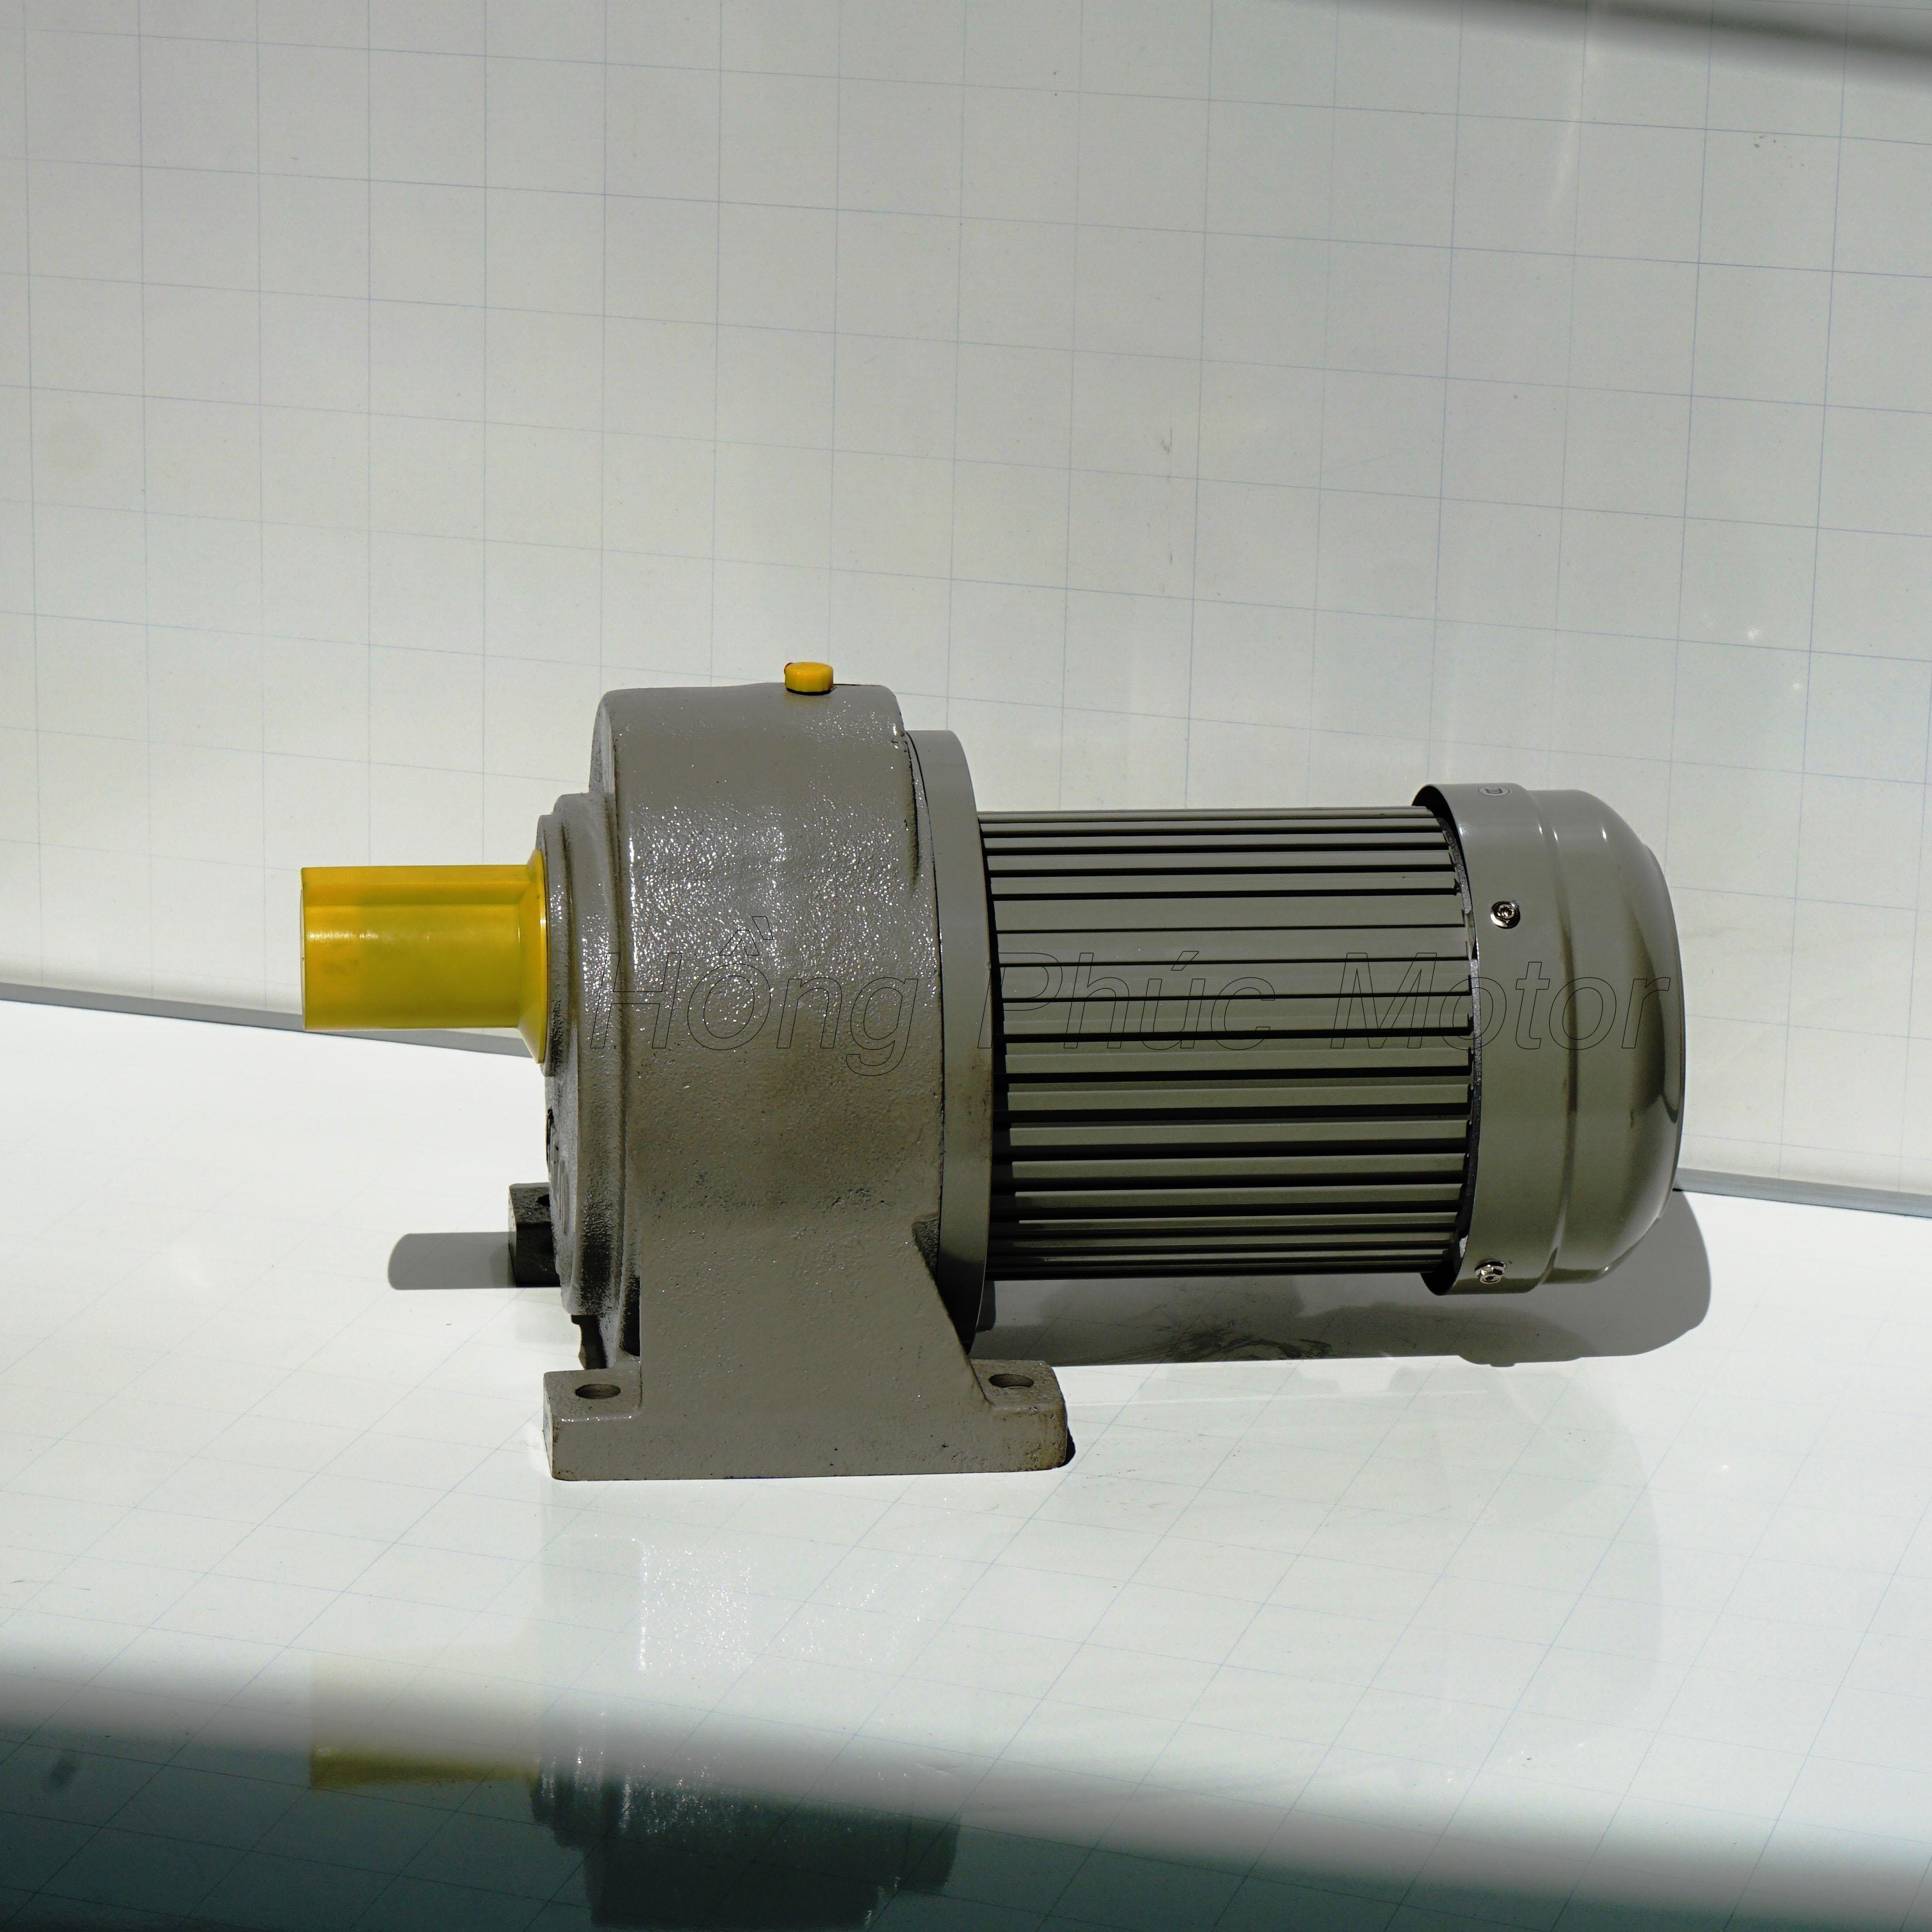 motor-giam-toc-0.8-kw-1hp-i-75